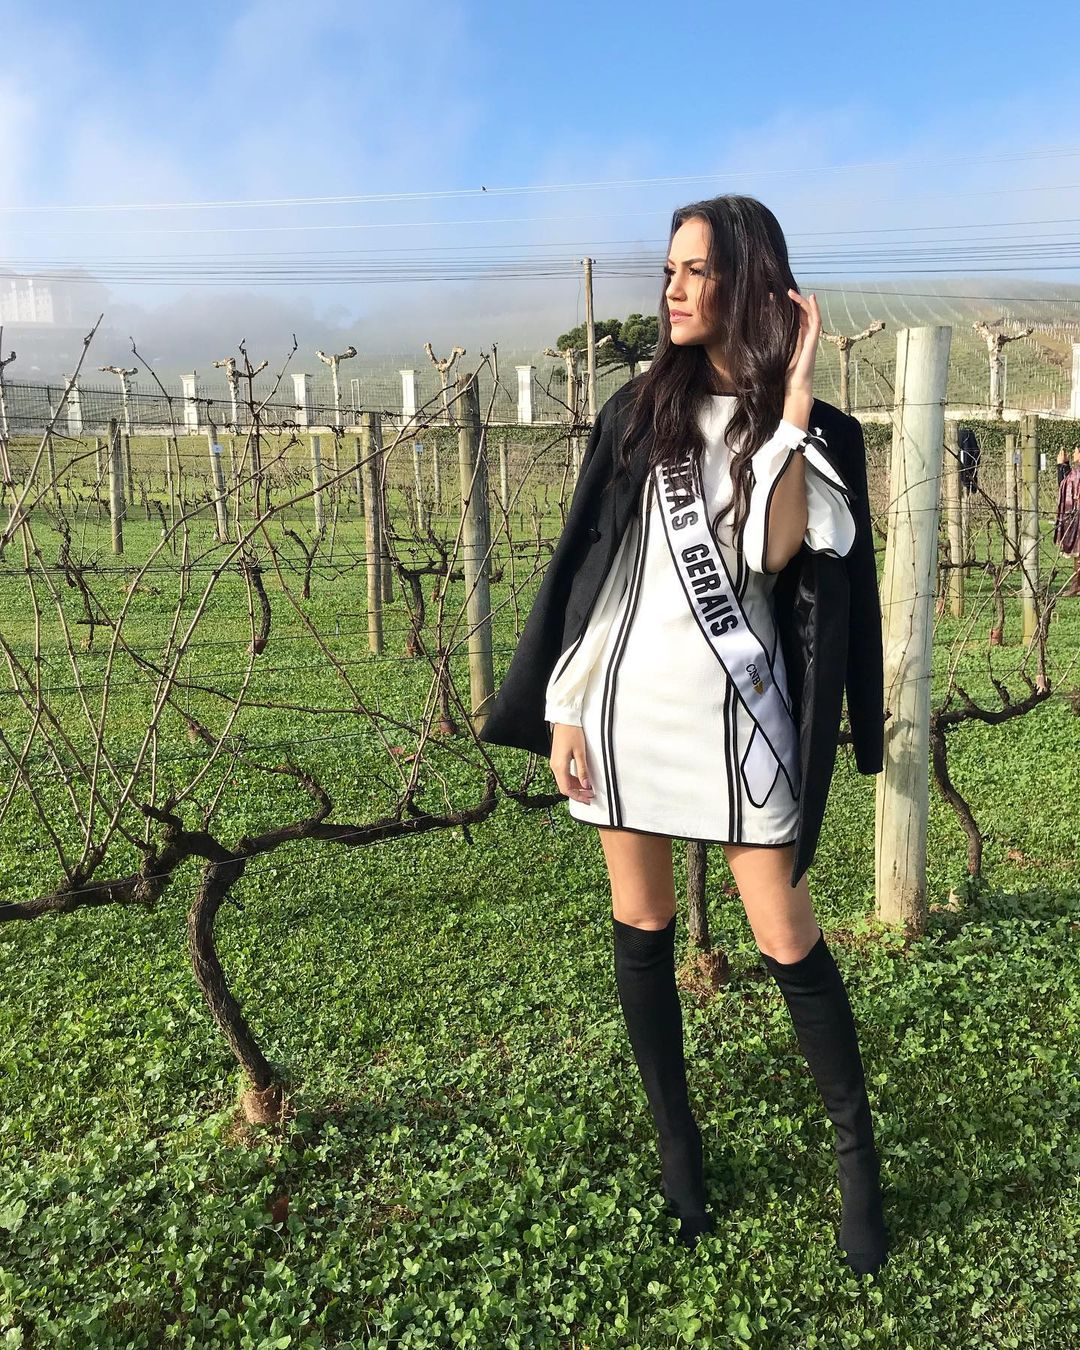 rafaella felipe, top 20 de miss brasil mundo 2019. - Página 9 84108611